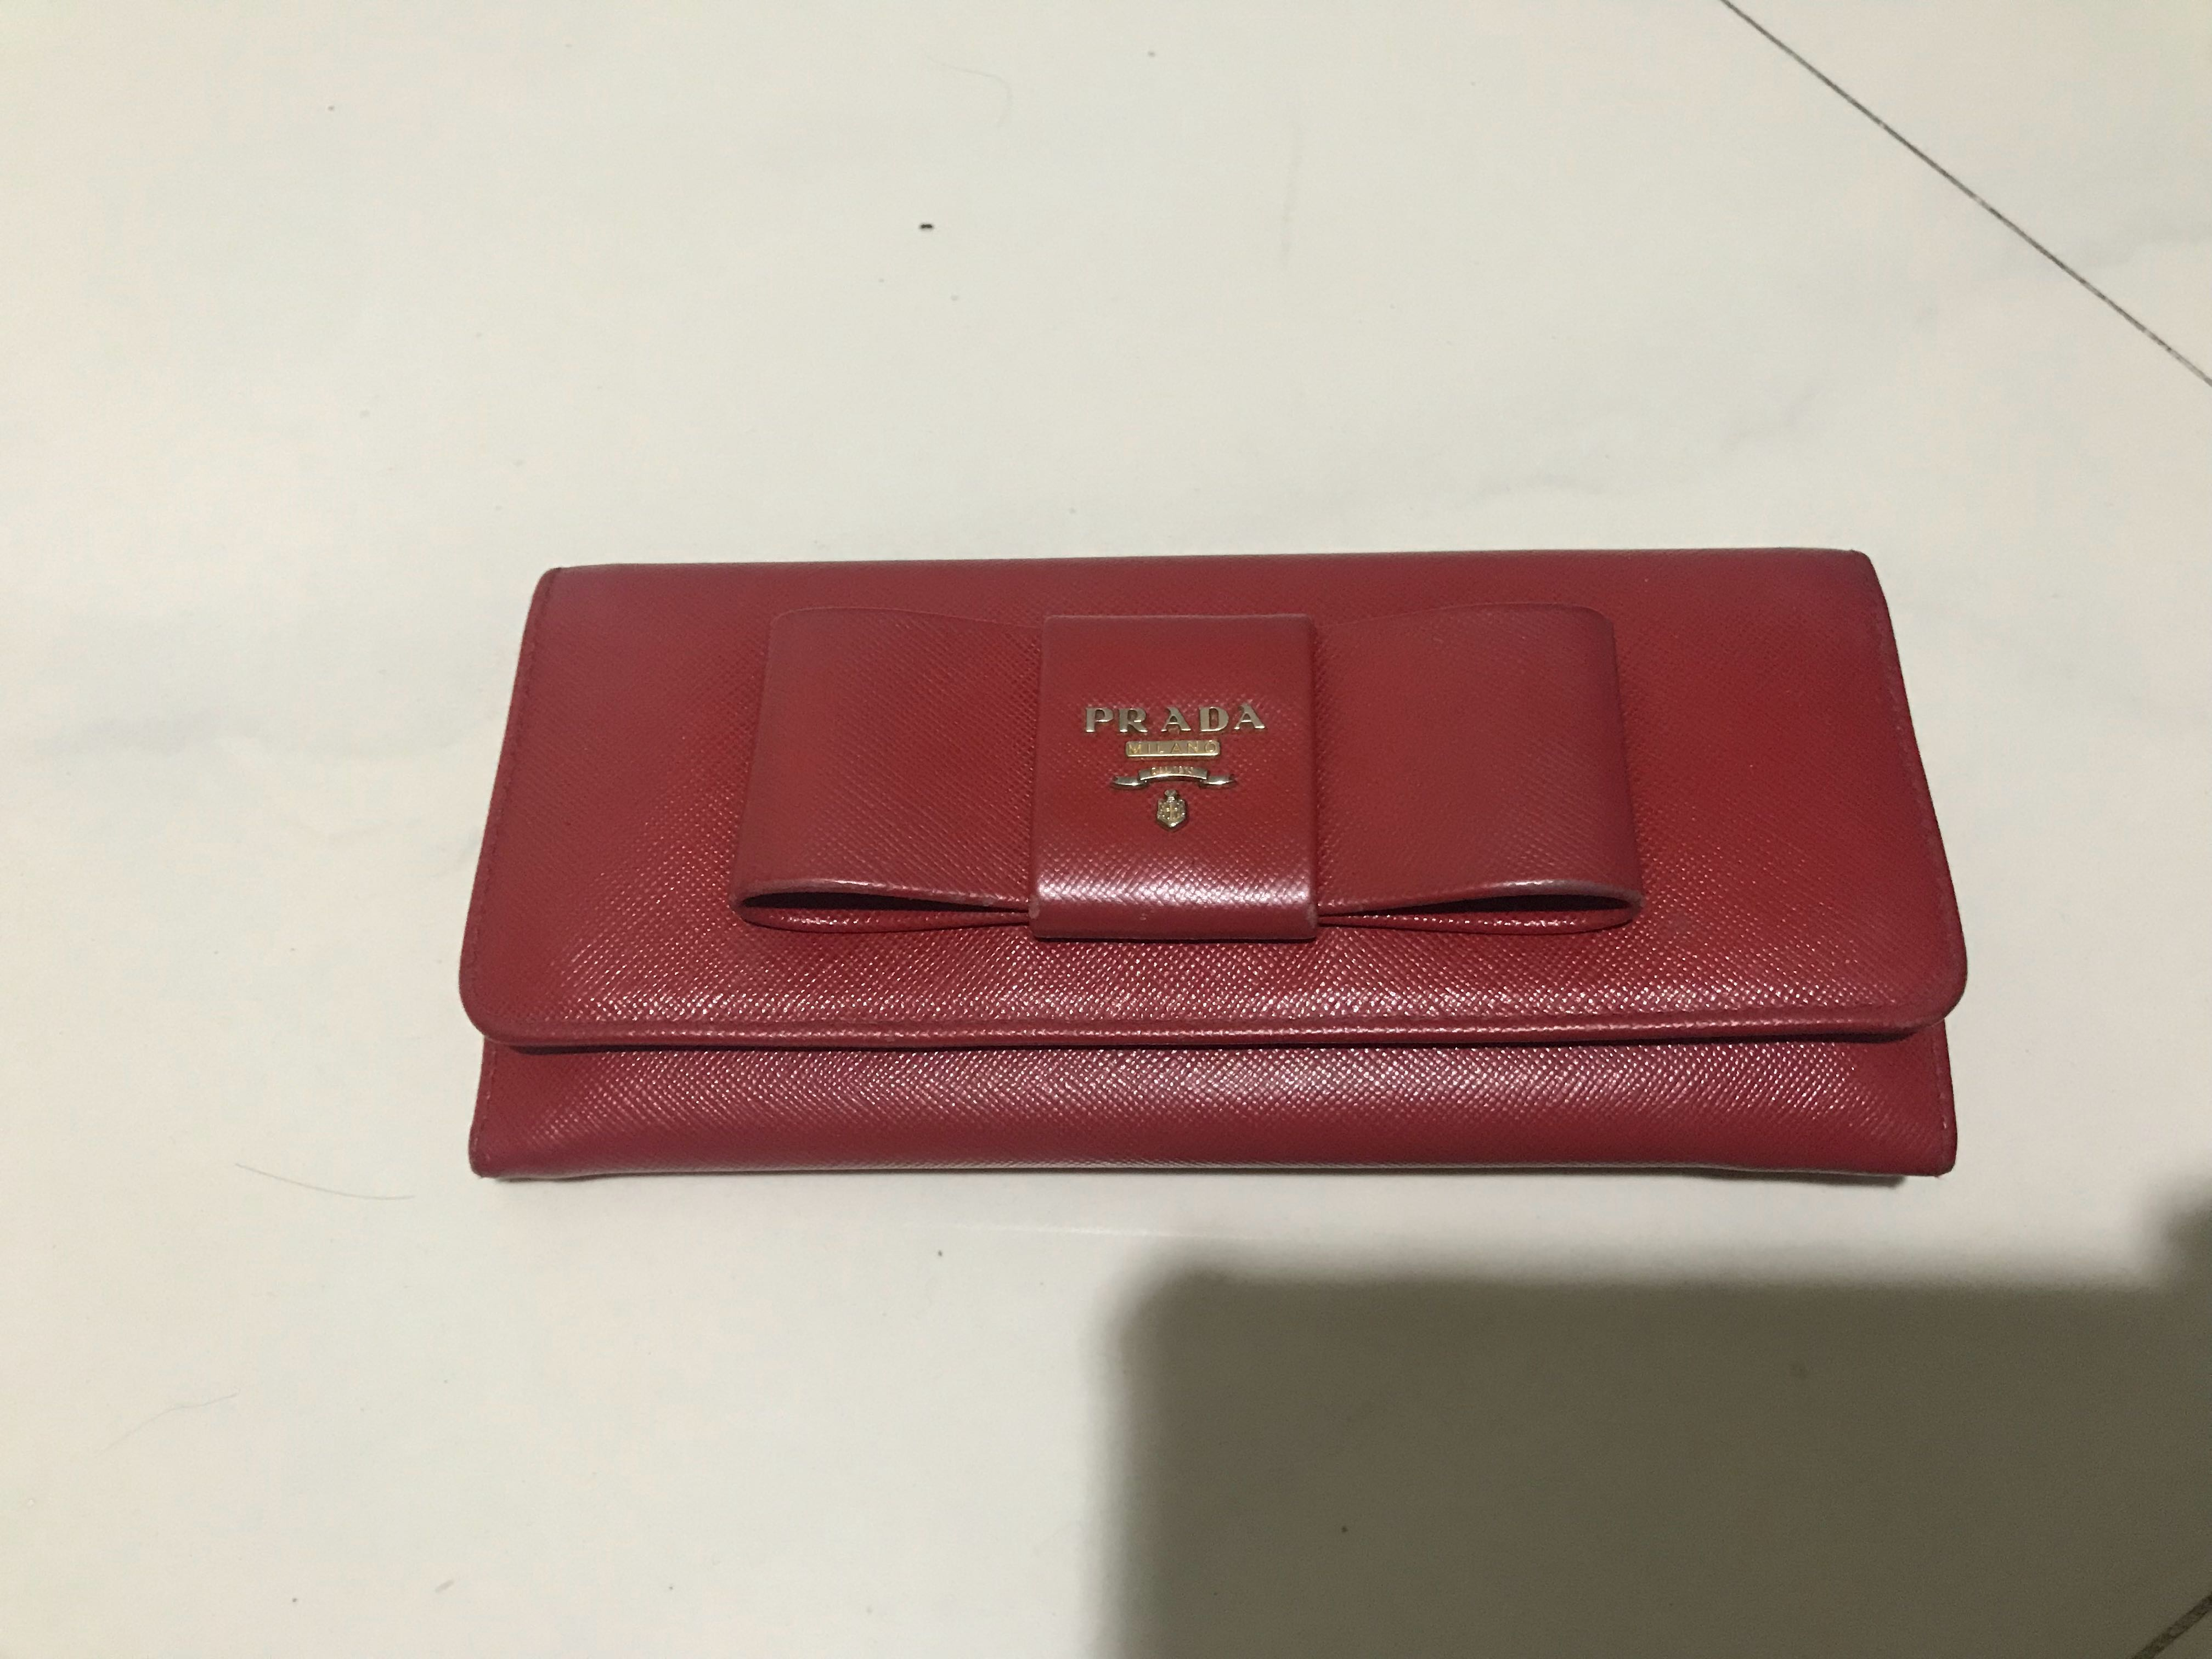 5cc35b682bfa Authentic Prada Long Wallet, Women's Fashion, Bags & Wallets ...